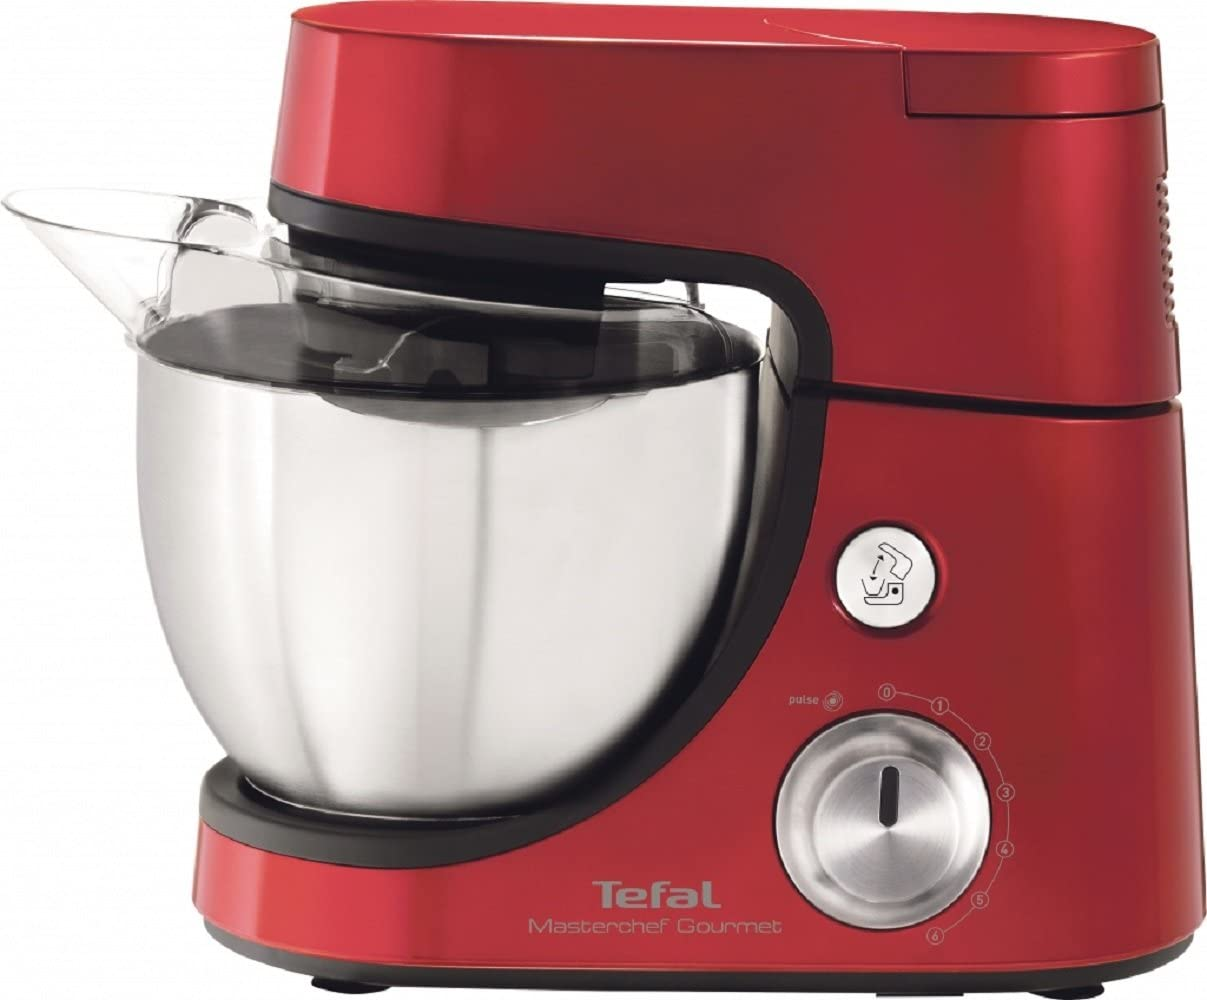 Tefal QB504G 900W 4.6L Rojo - Robot de cocina (4,6 L, Rojo, Giratorio, Acero inoxidable, 900 W): Amazon.es: Hogar